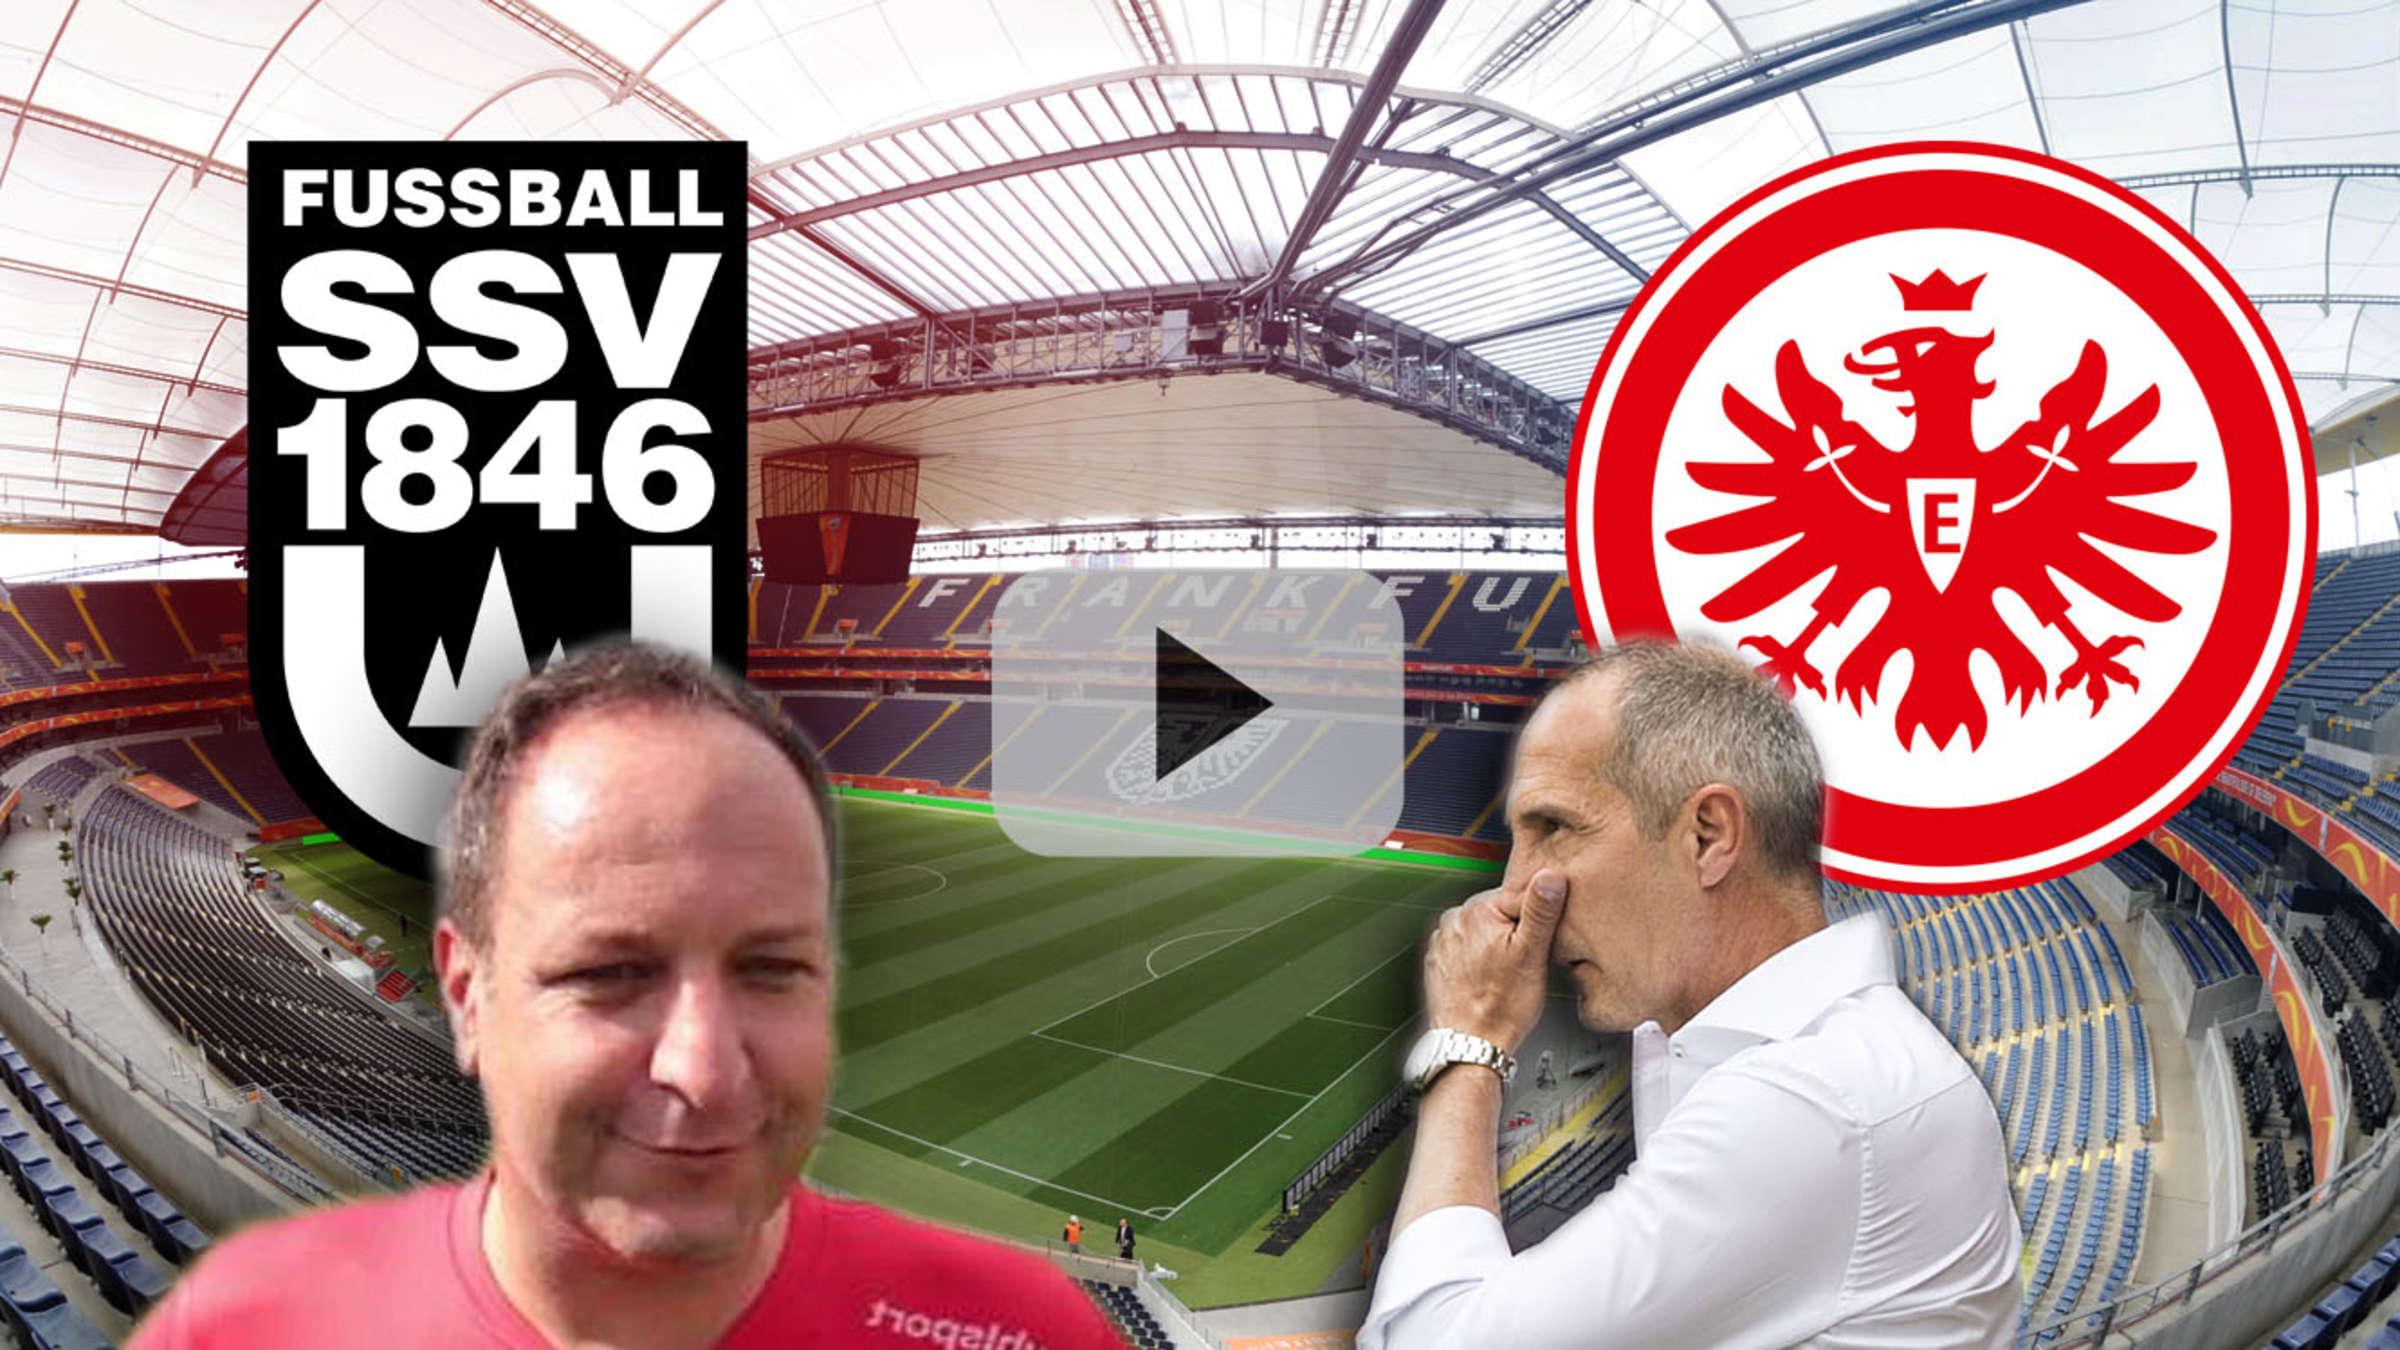 Heute Dfb Pokal ᐓ Ssv Ulm Eintracht Frankfurt Im